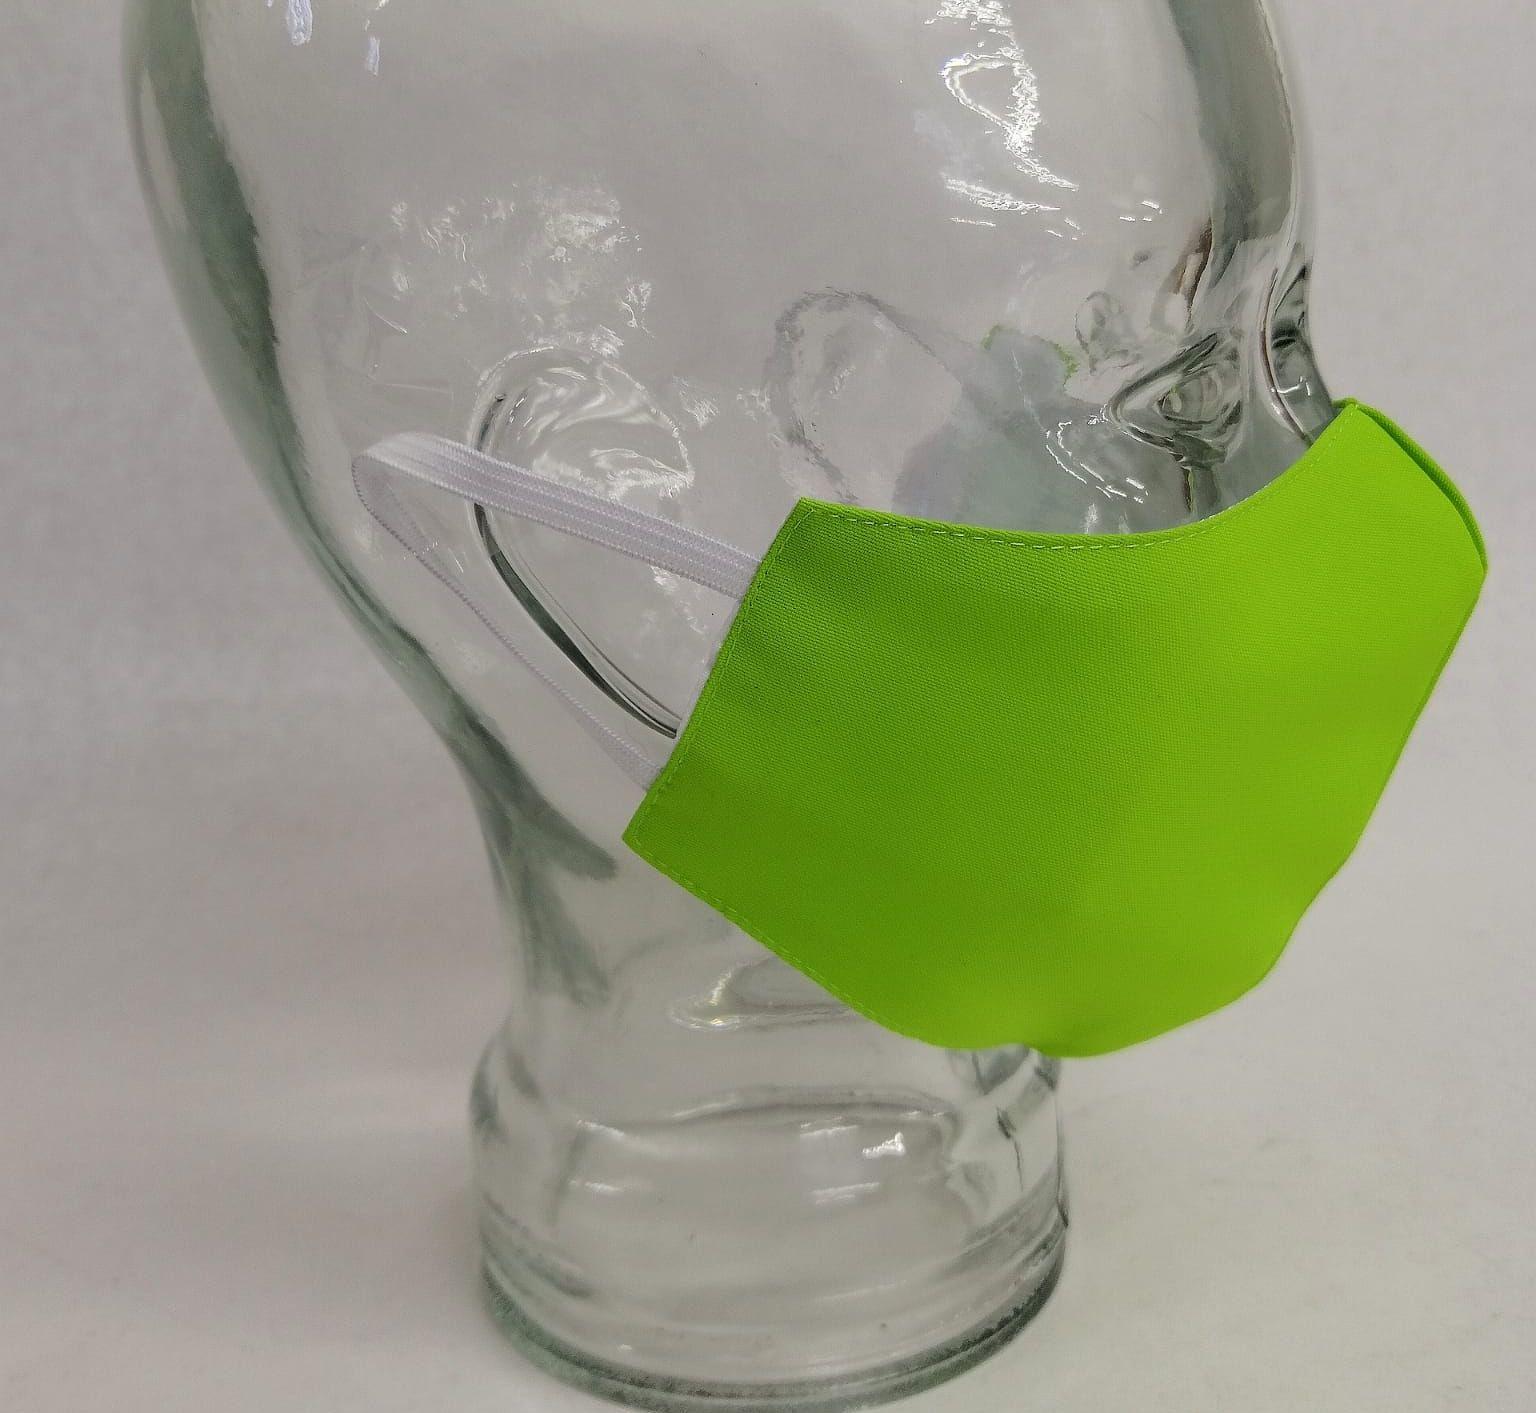 Mascarilla FFP2 Personalizada Reutilizable. Color verde Pistacho